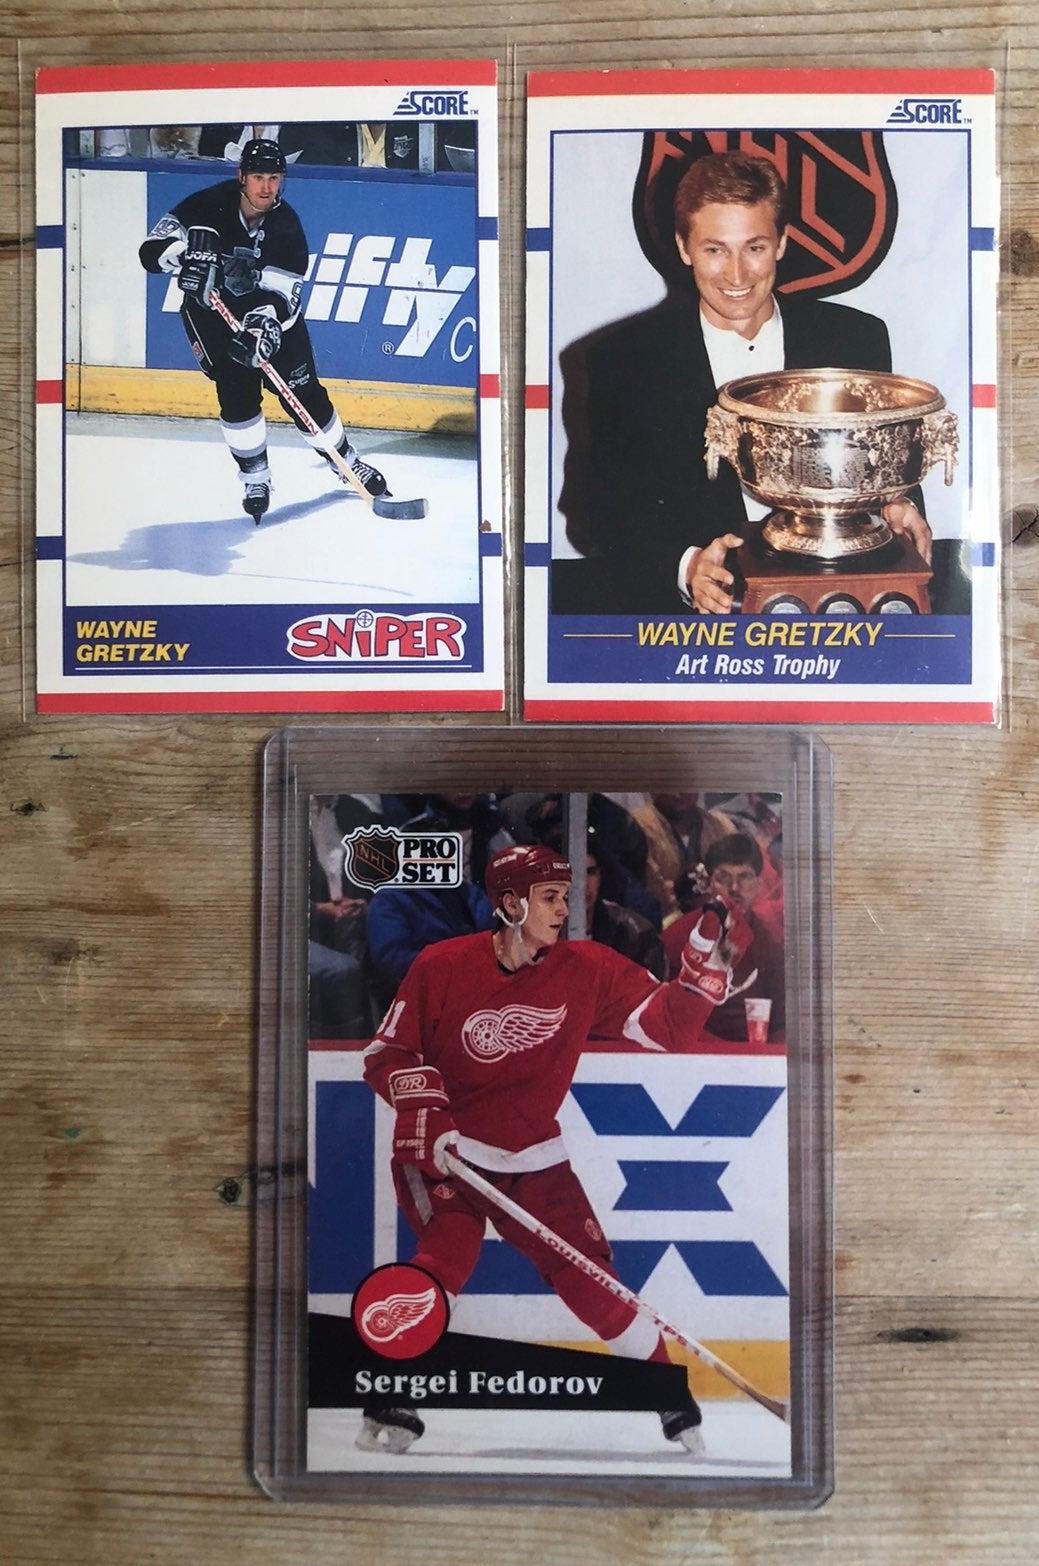 1990 Wayne Gretzky and 91 Federov rookie